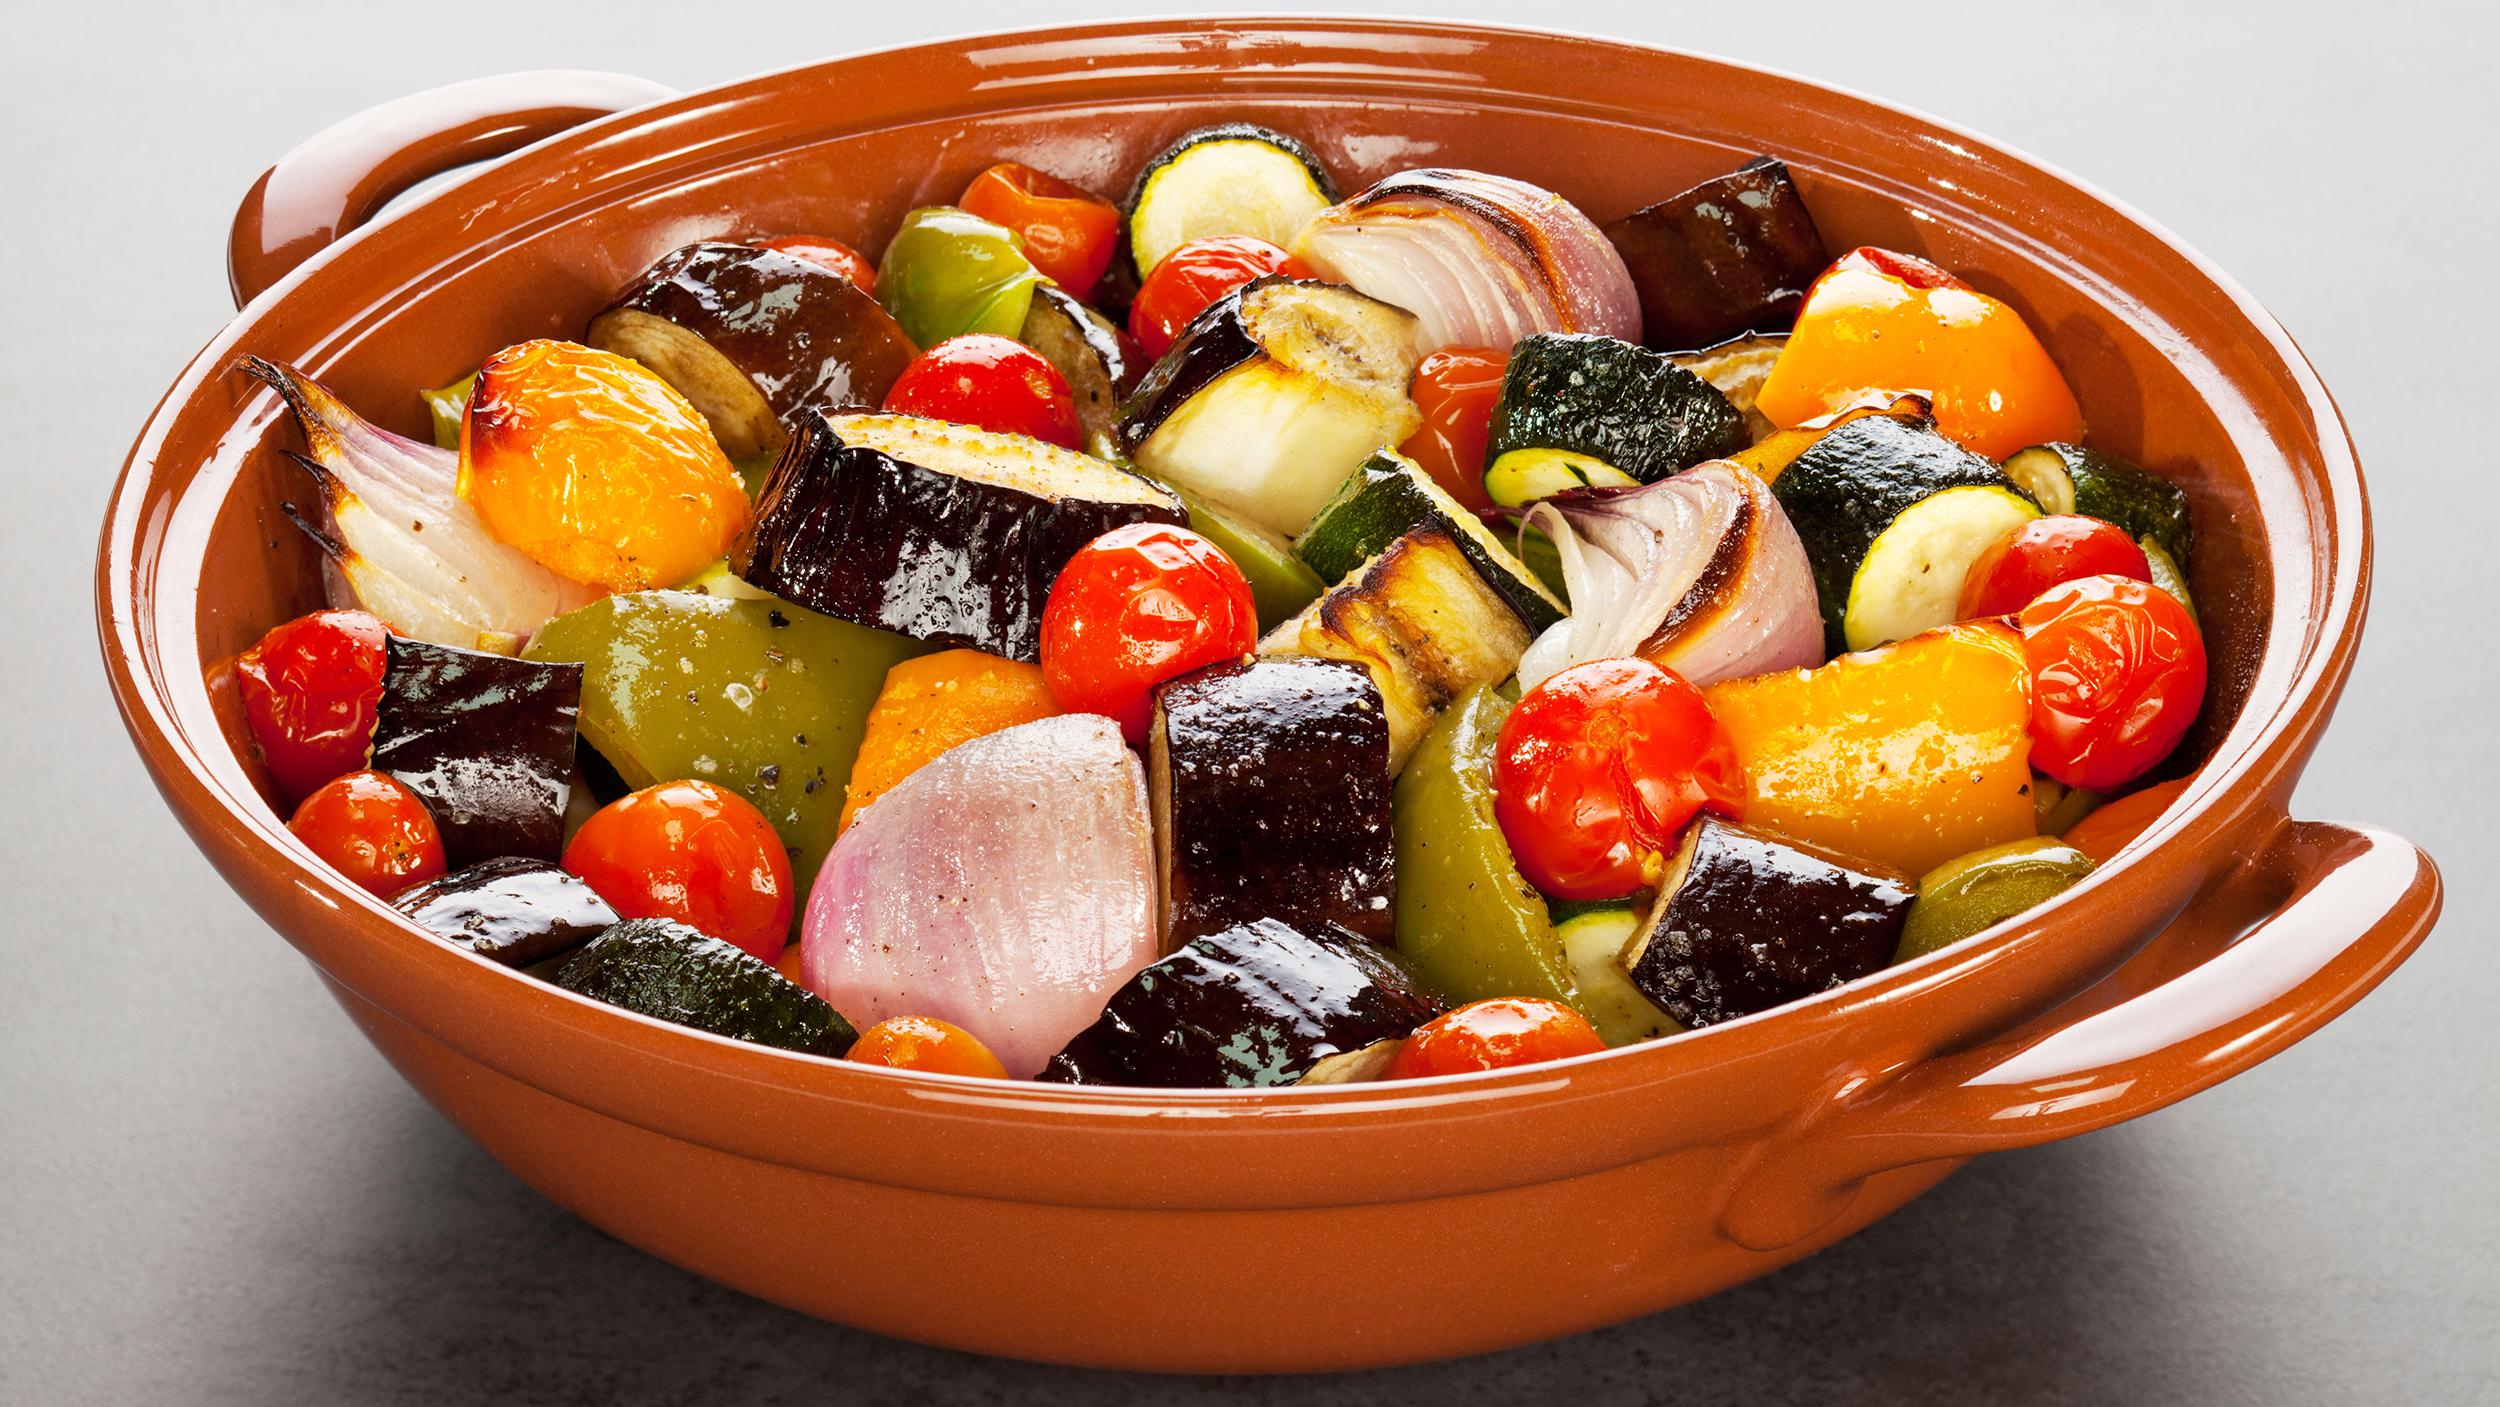 ratatouille-mediterranean-diet-today-170104-tease_45e155f863f0ec24b235741d8fb6367b.jpg